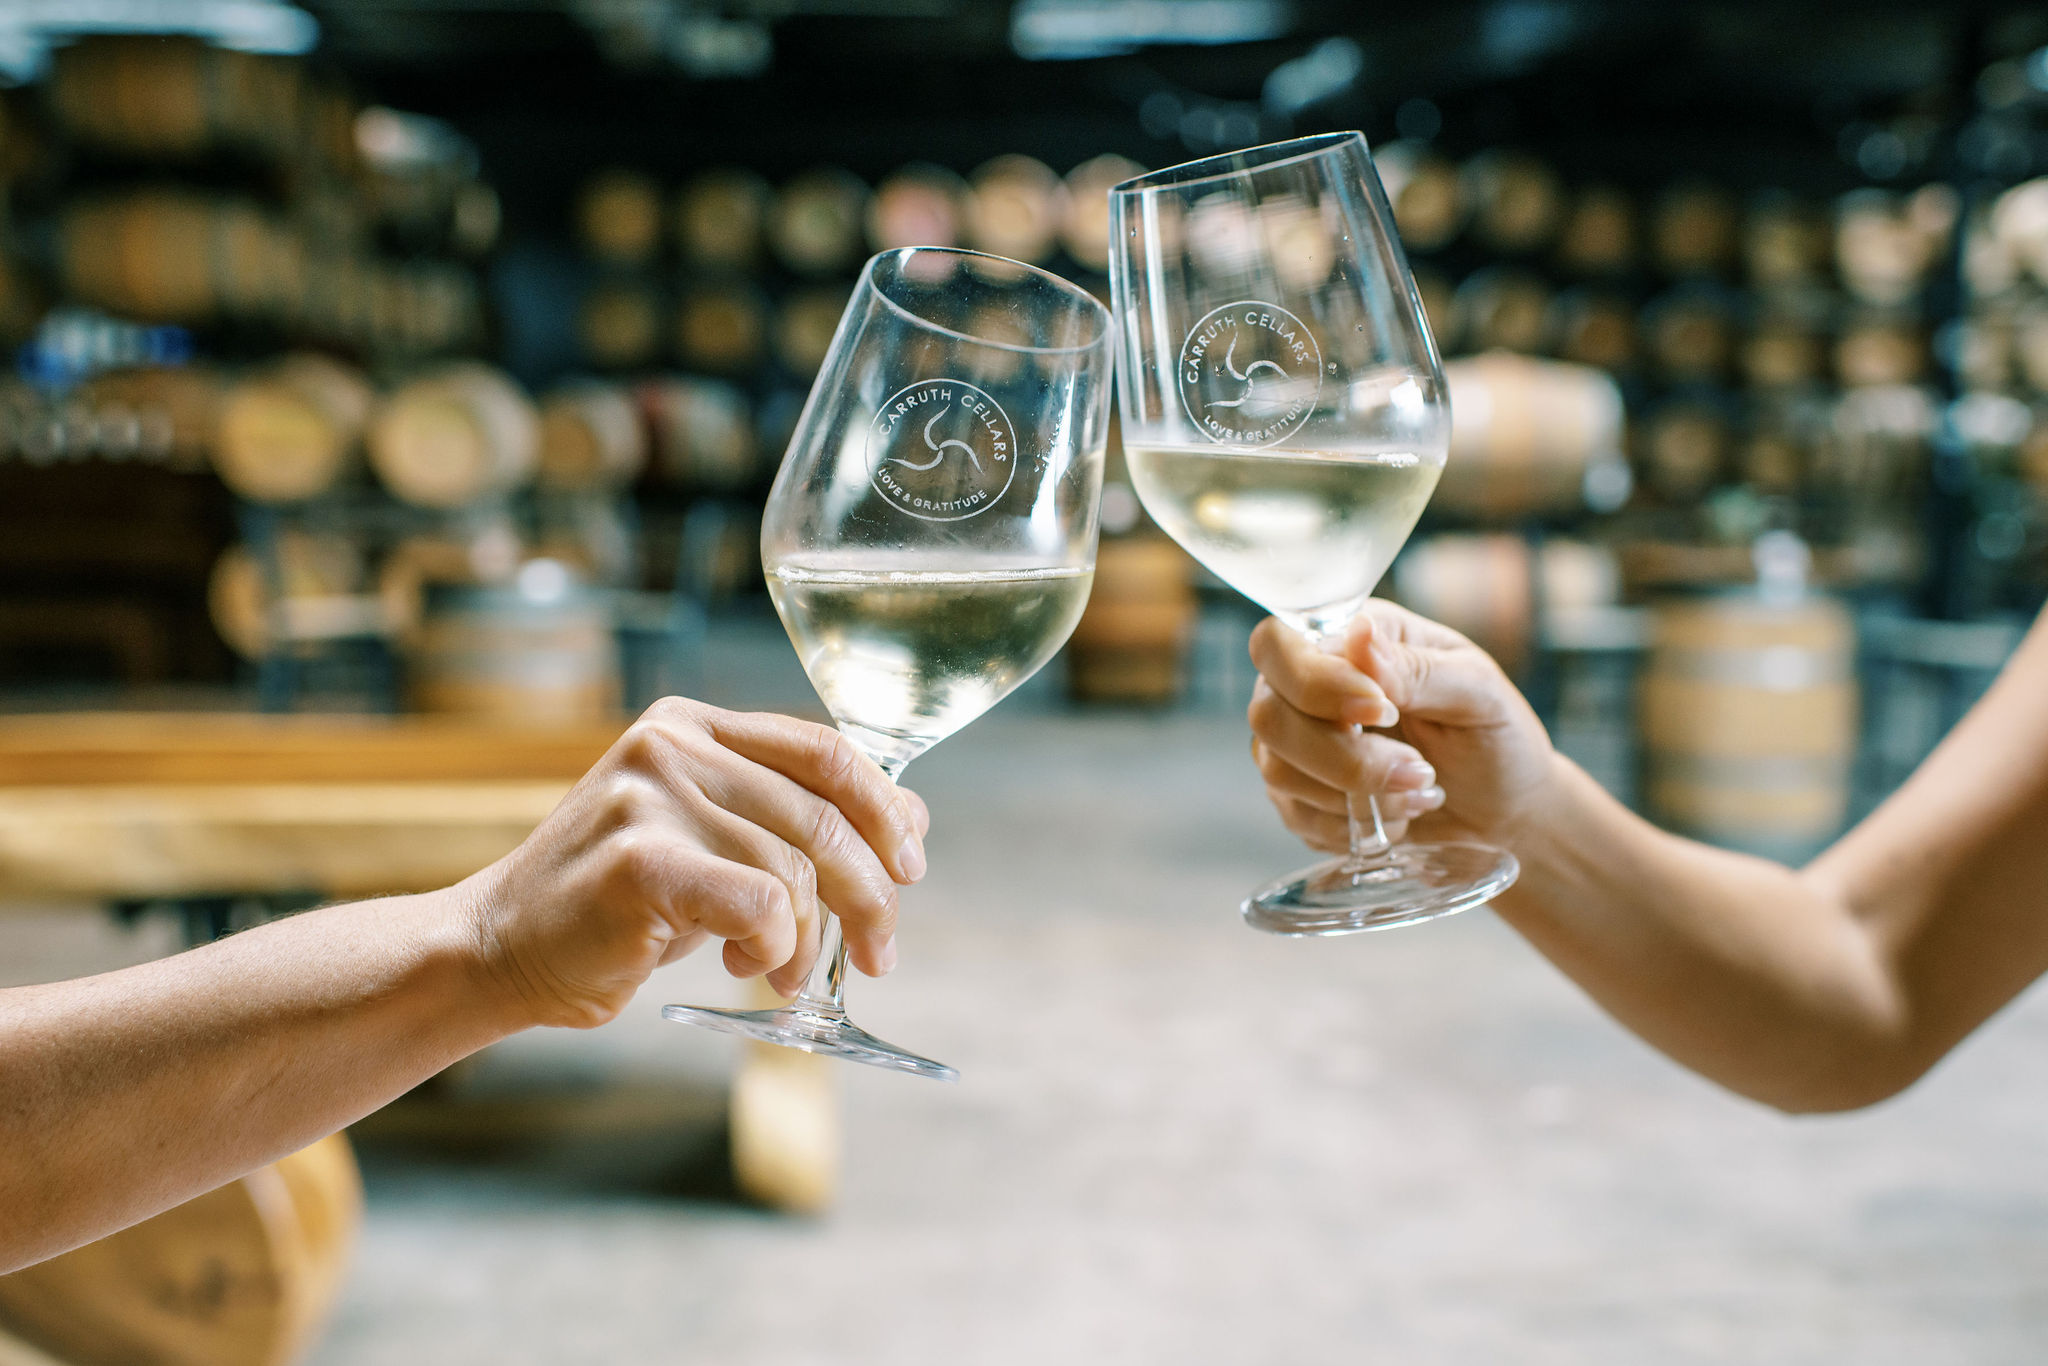 Carruth Cellars flagship Urban Winery and Tasting Room San Diego CA